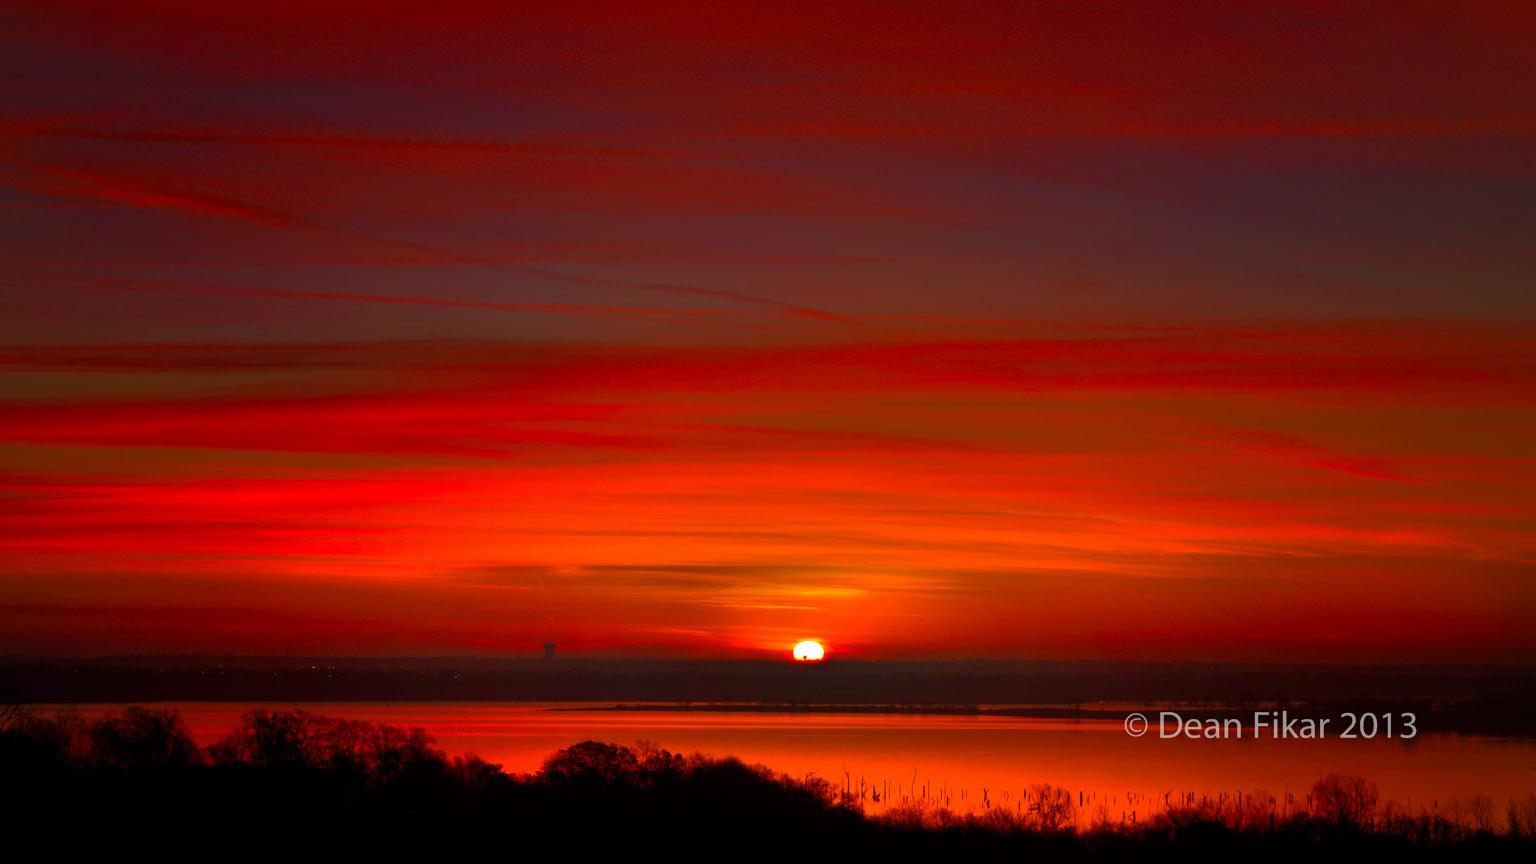 North Hi Mount, Fort Worth, TX, USA Sunrise Sunset Times